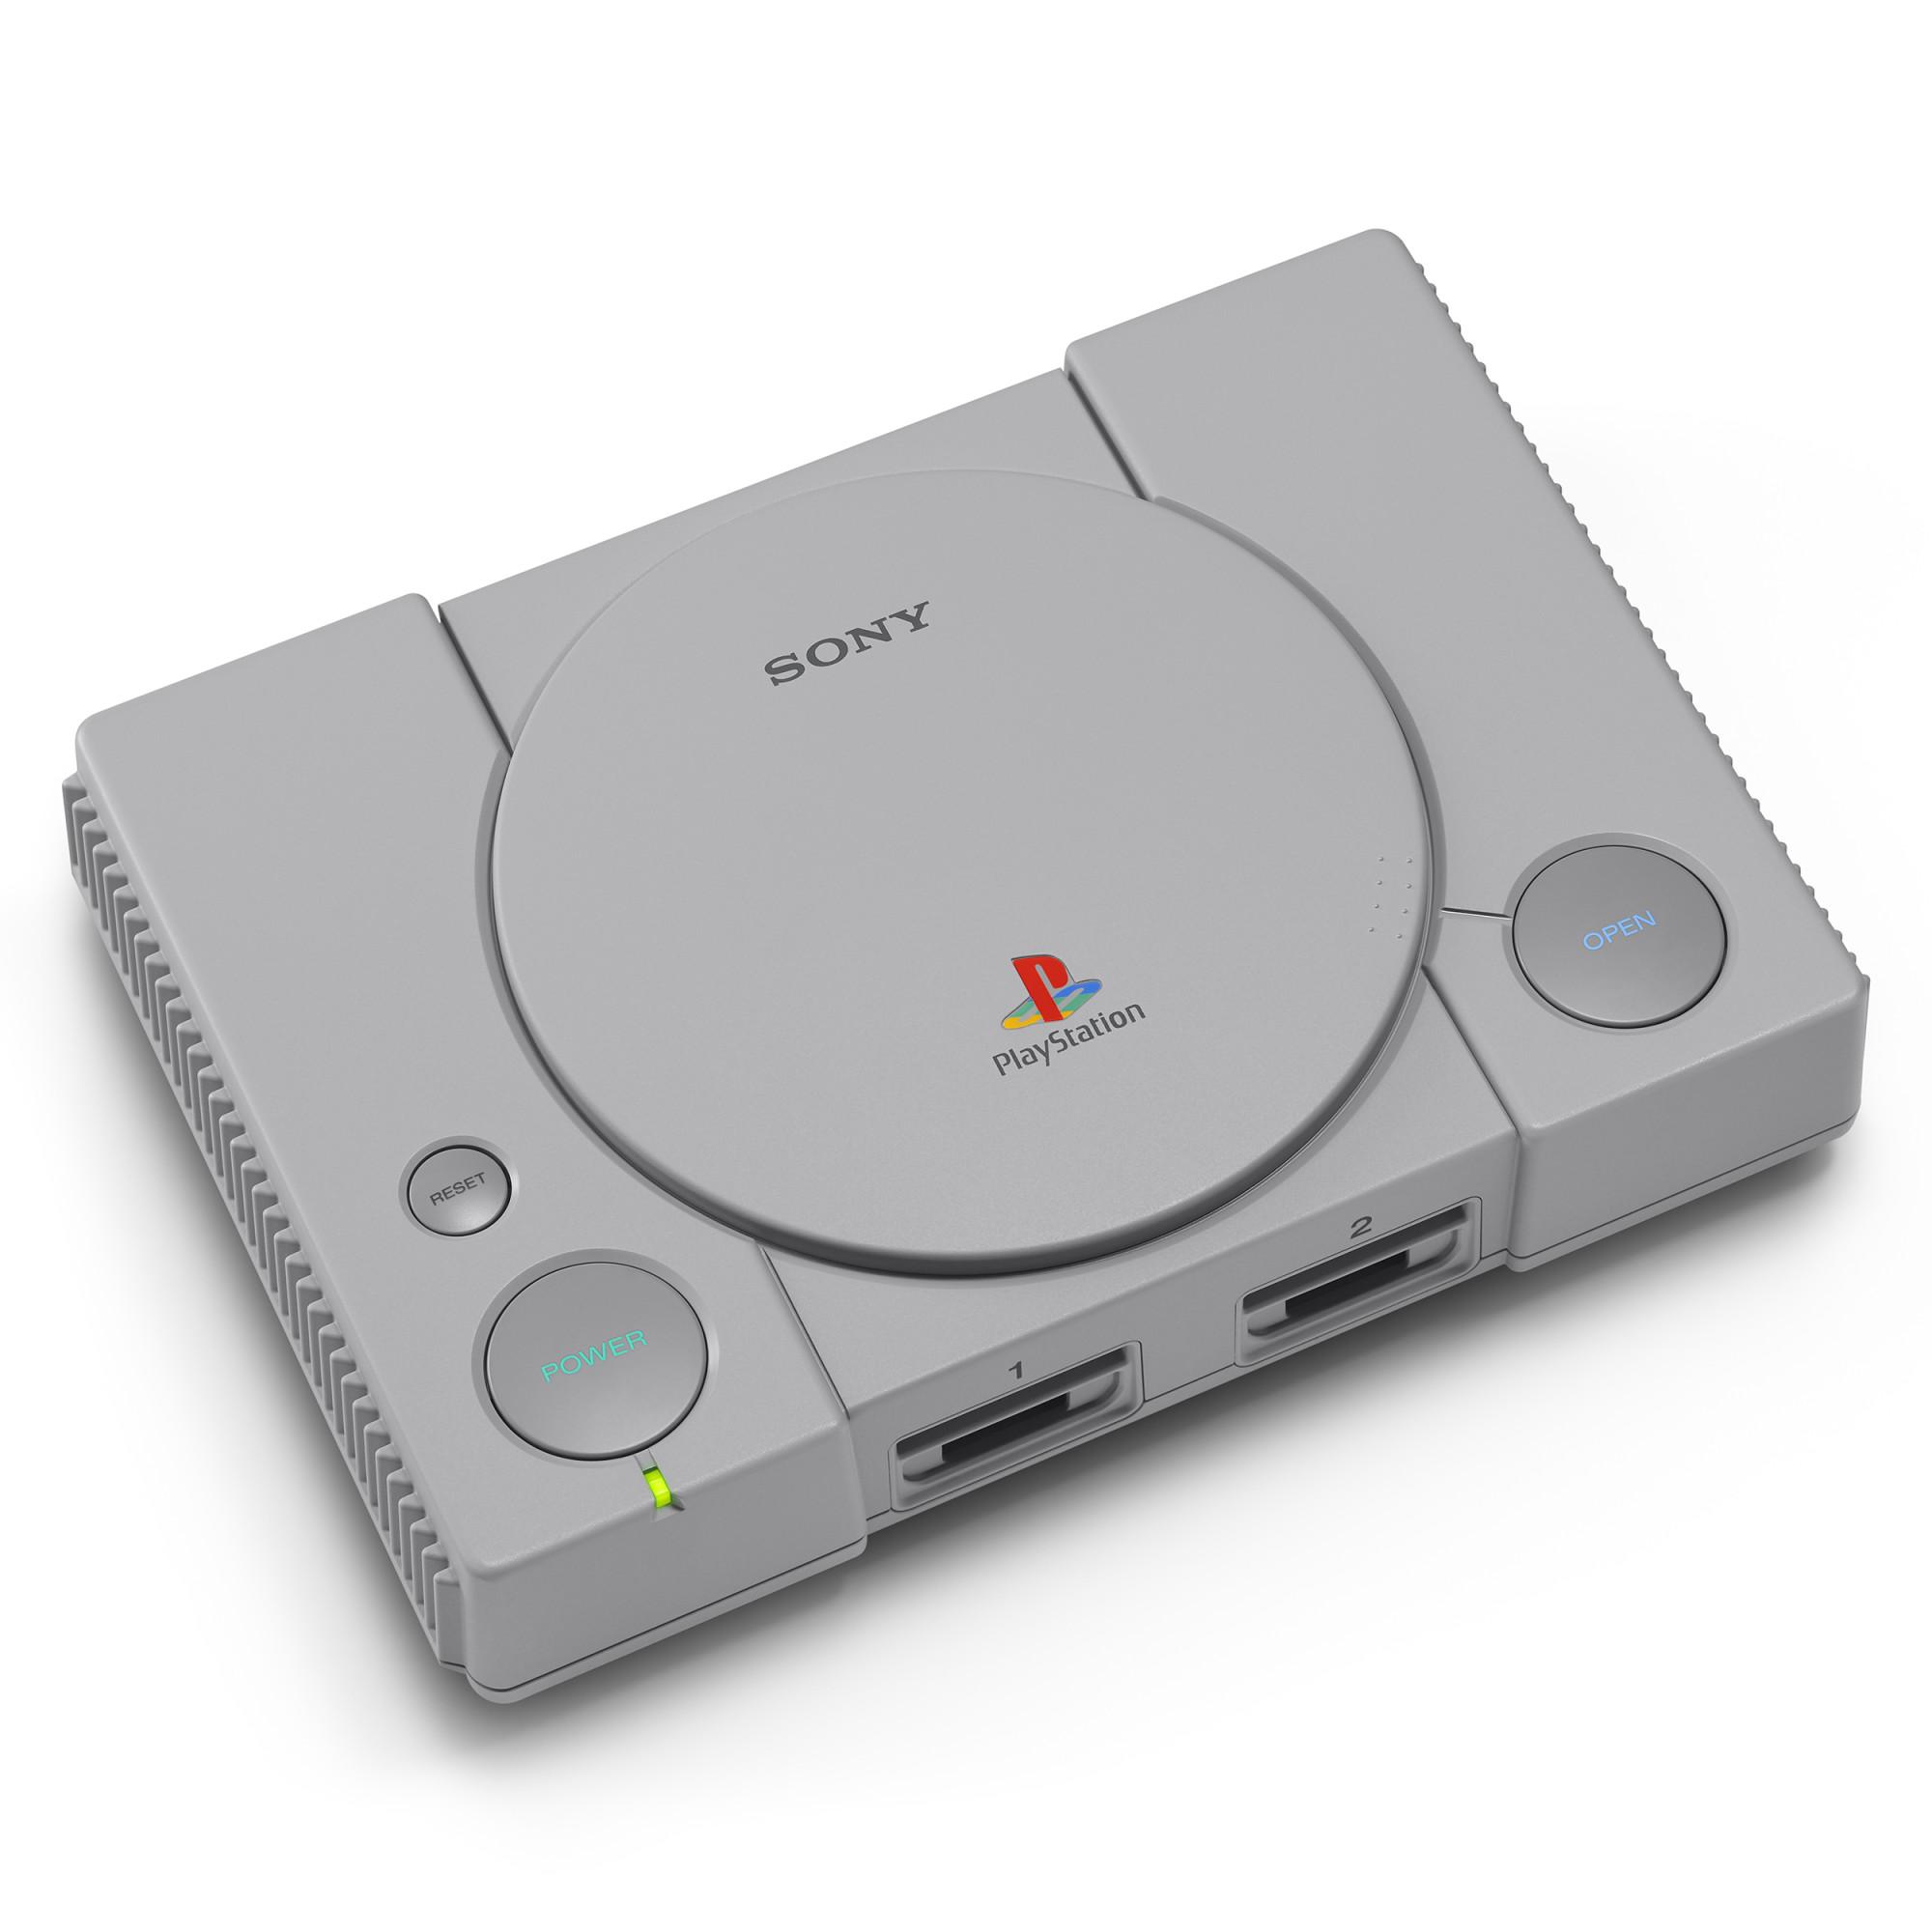 Consola Sony Playstation Classic + 20 jocuri preinstalate 2